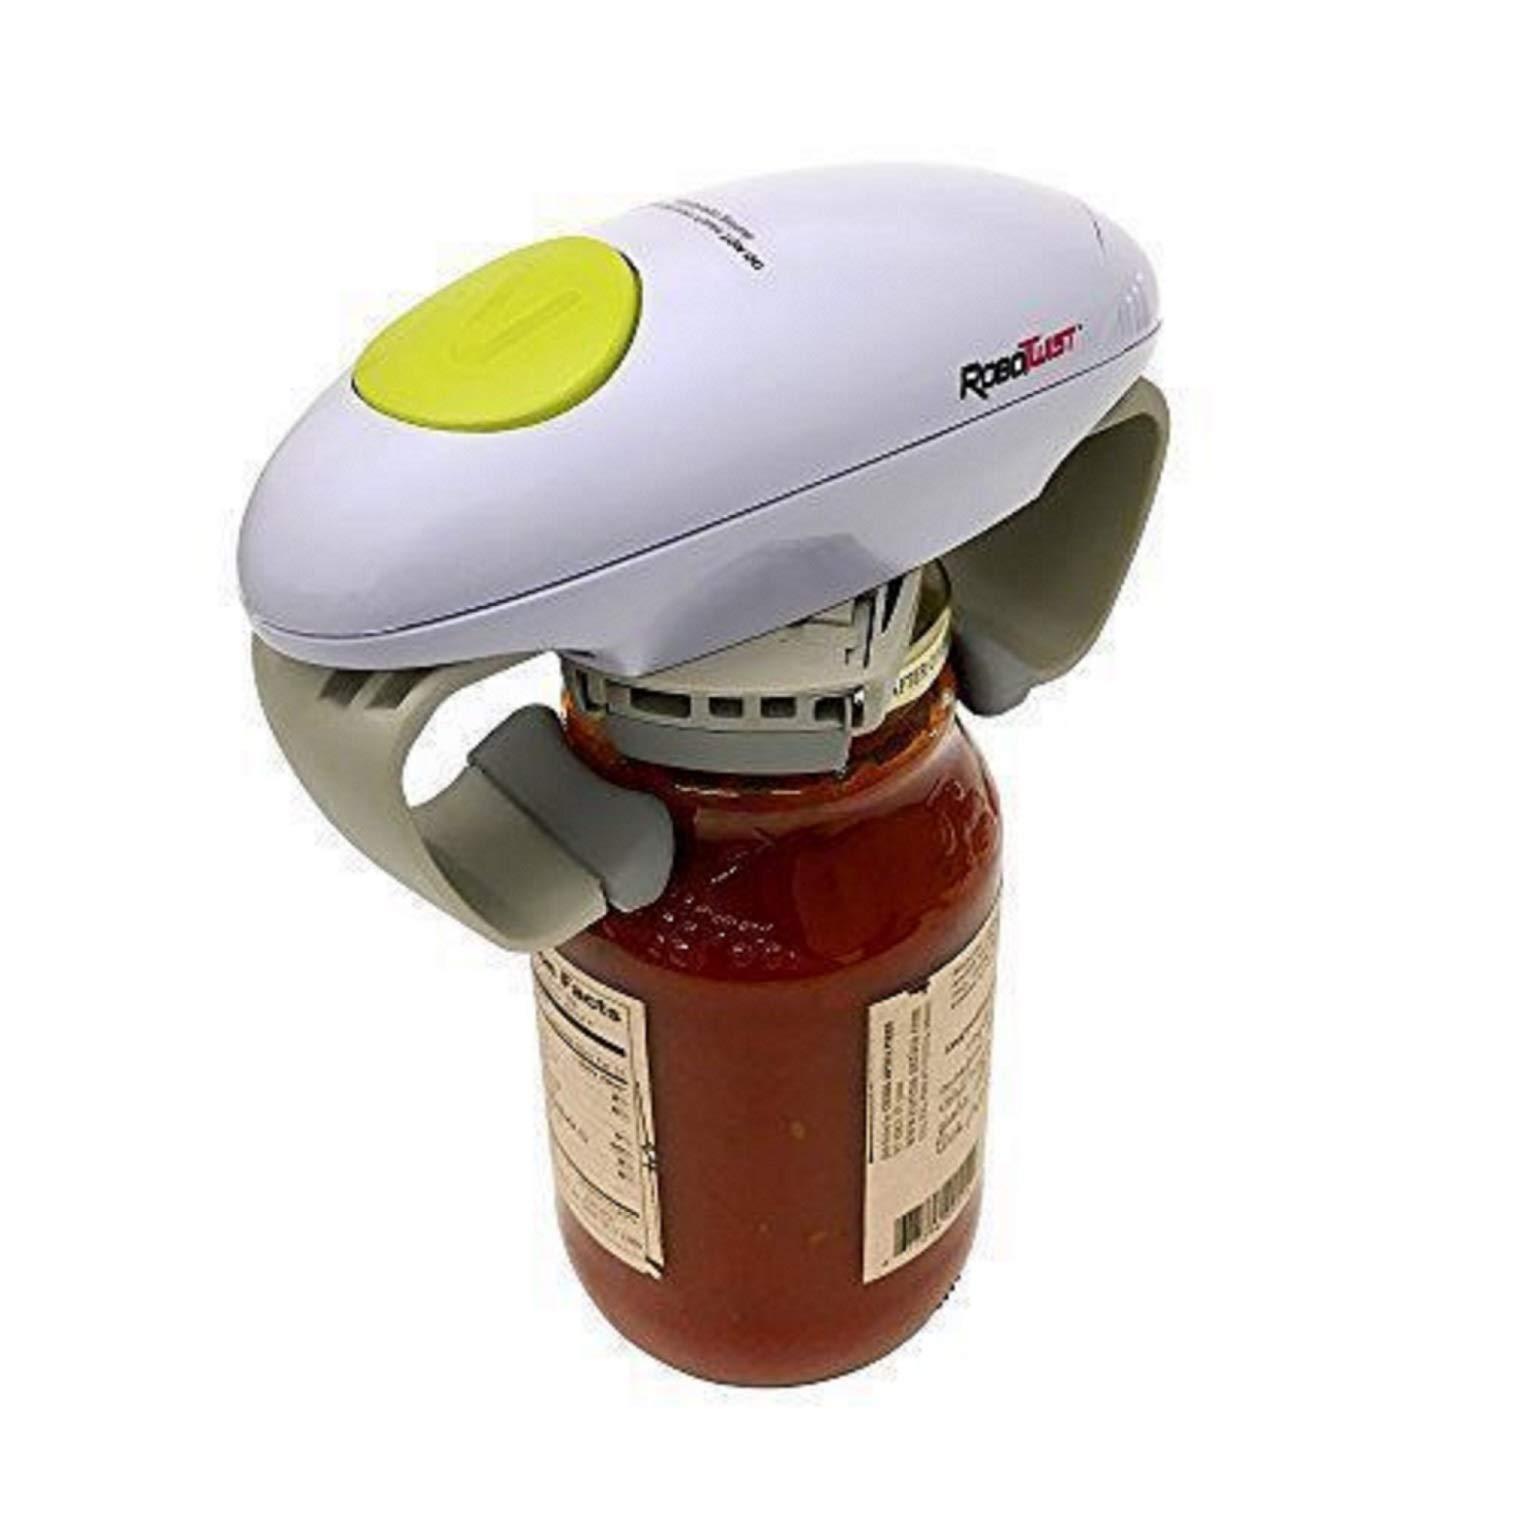 Robo Twist Jar Opener- The Original RoboTwist As Seen on TV Handsfree Easy Jar Opener- Works on All Jar Sizes by Robo Twist